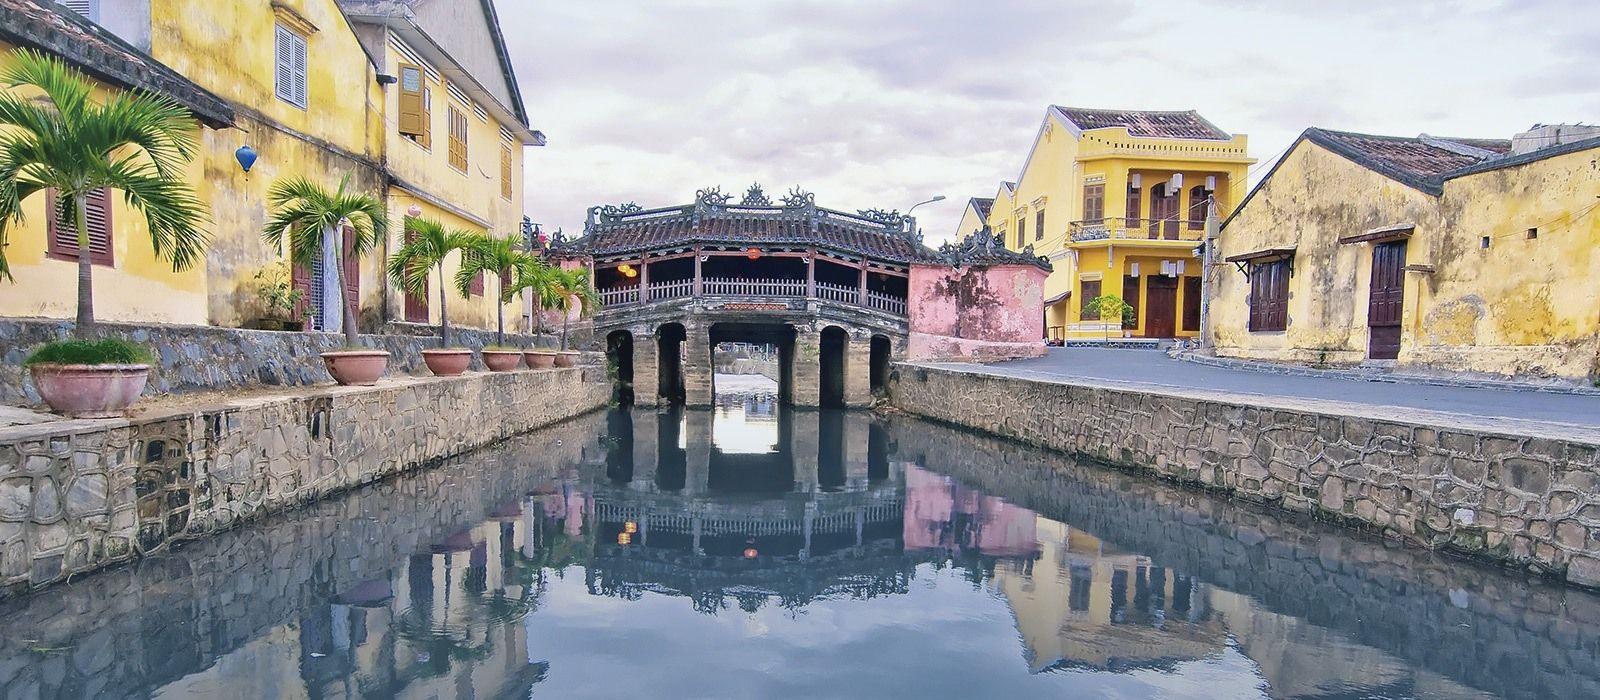 Reiseziel Hoi An Vietnam